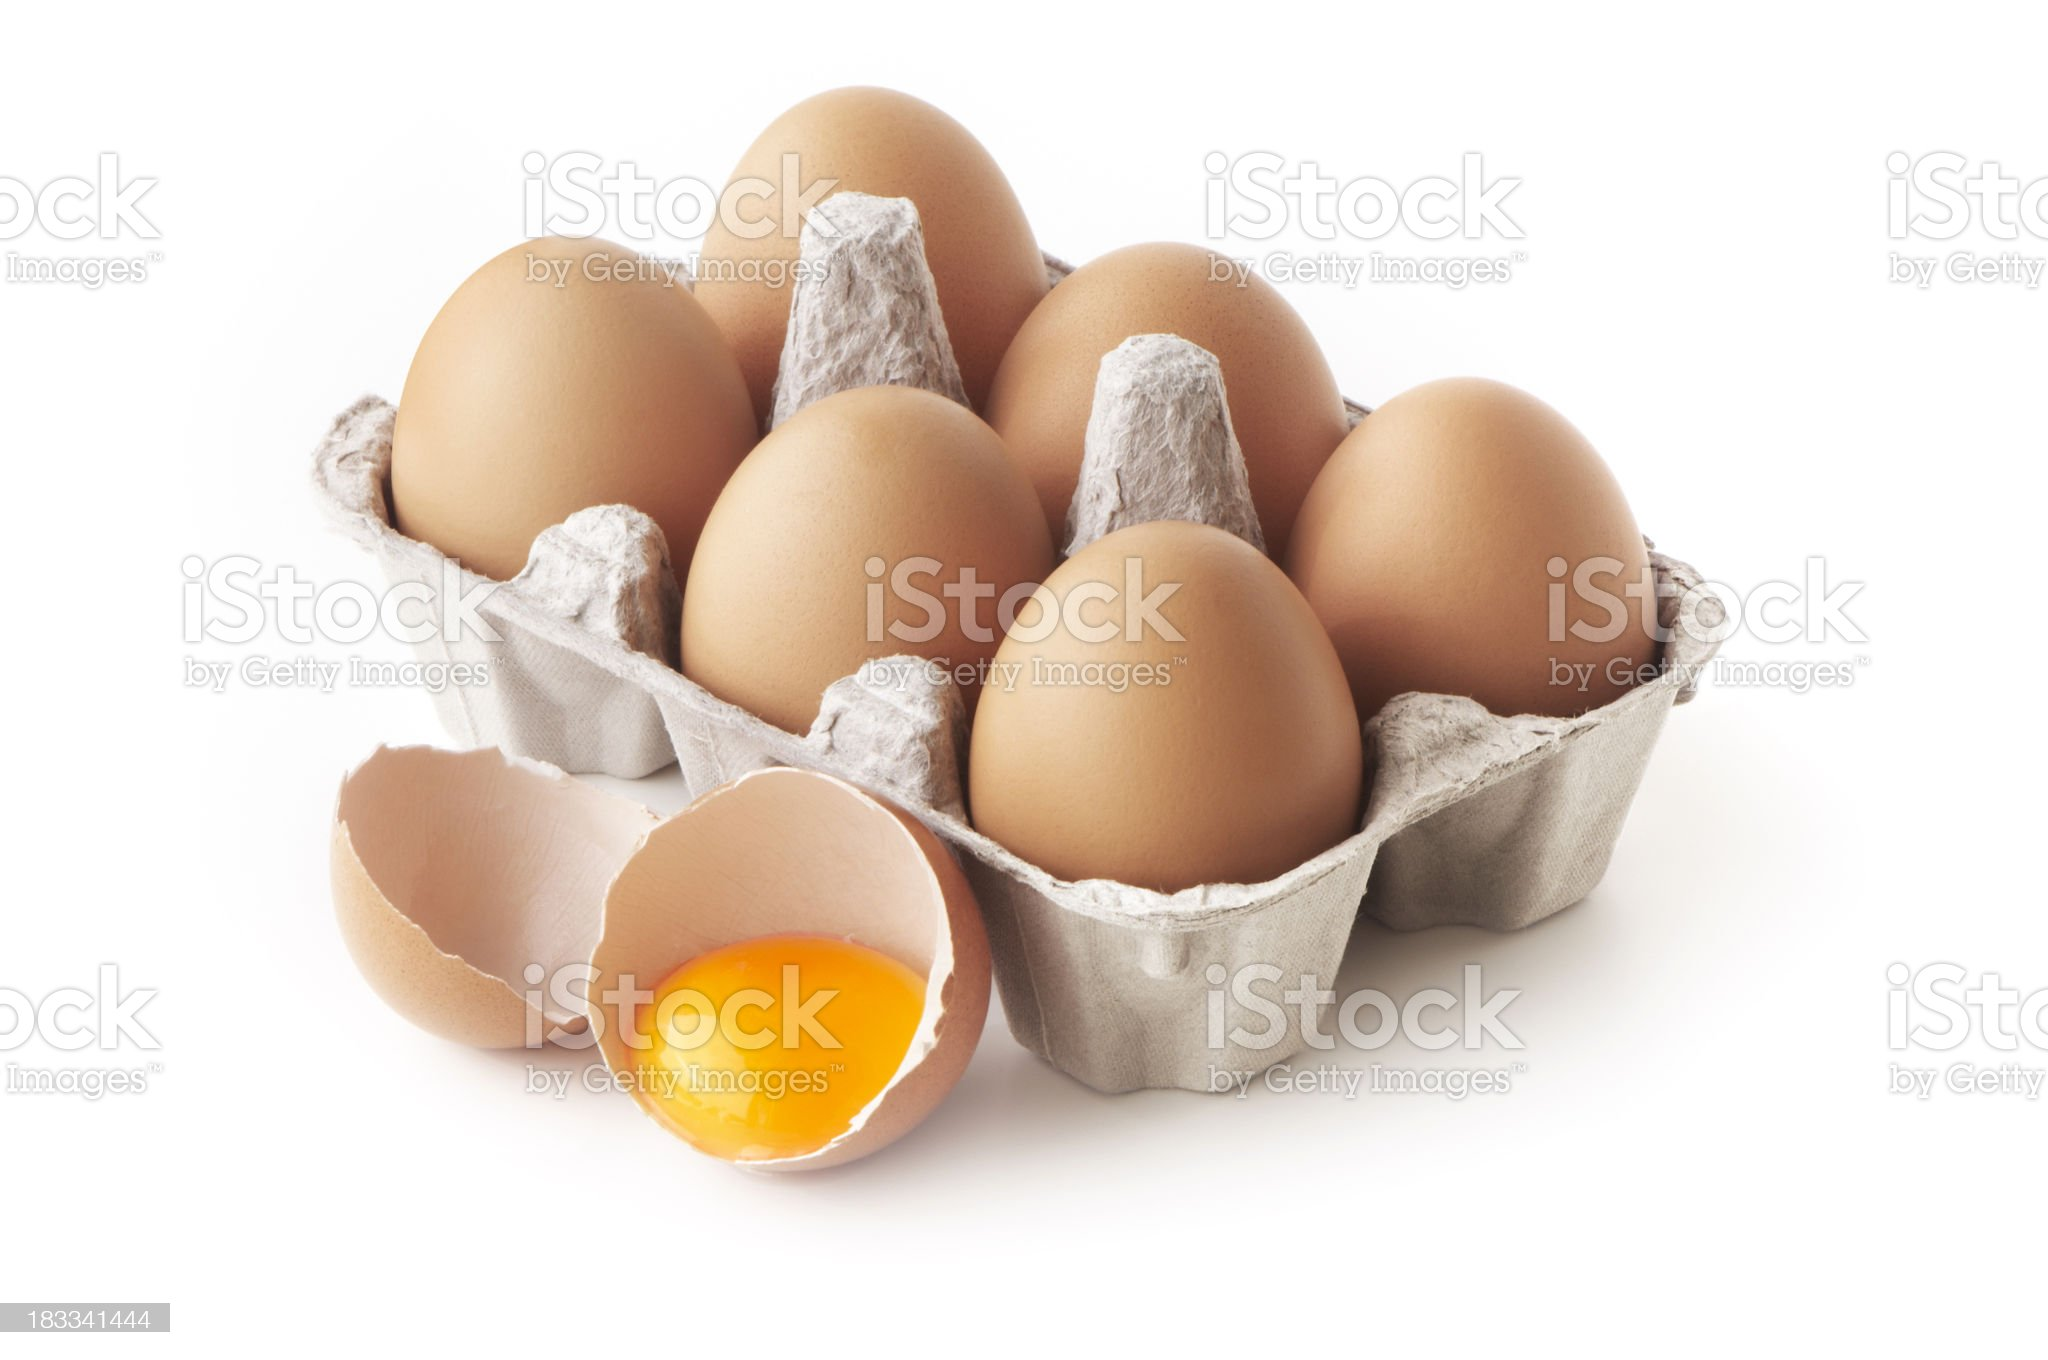 Eggs in carton royalty-free stock photo